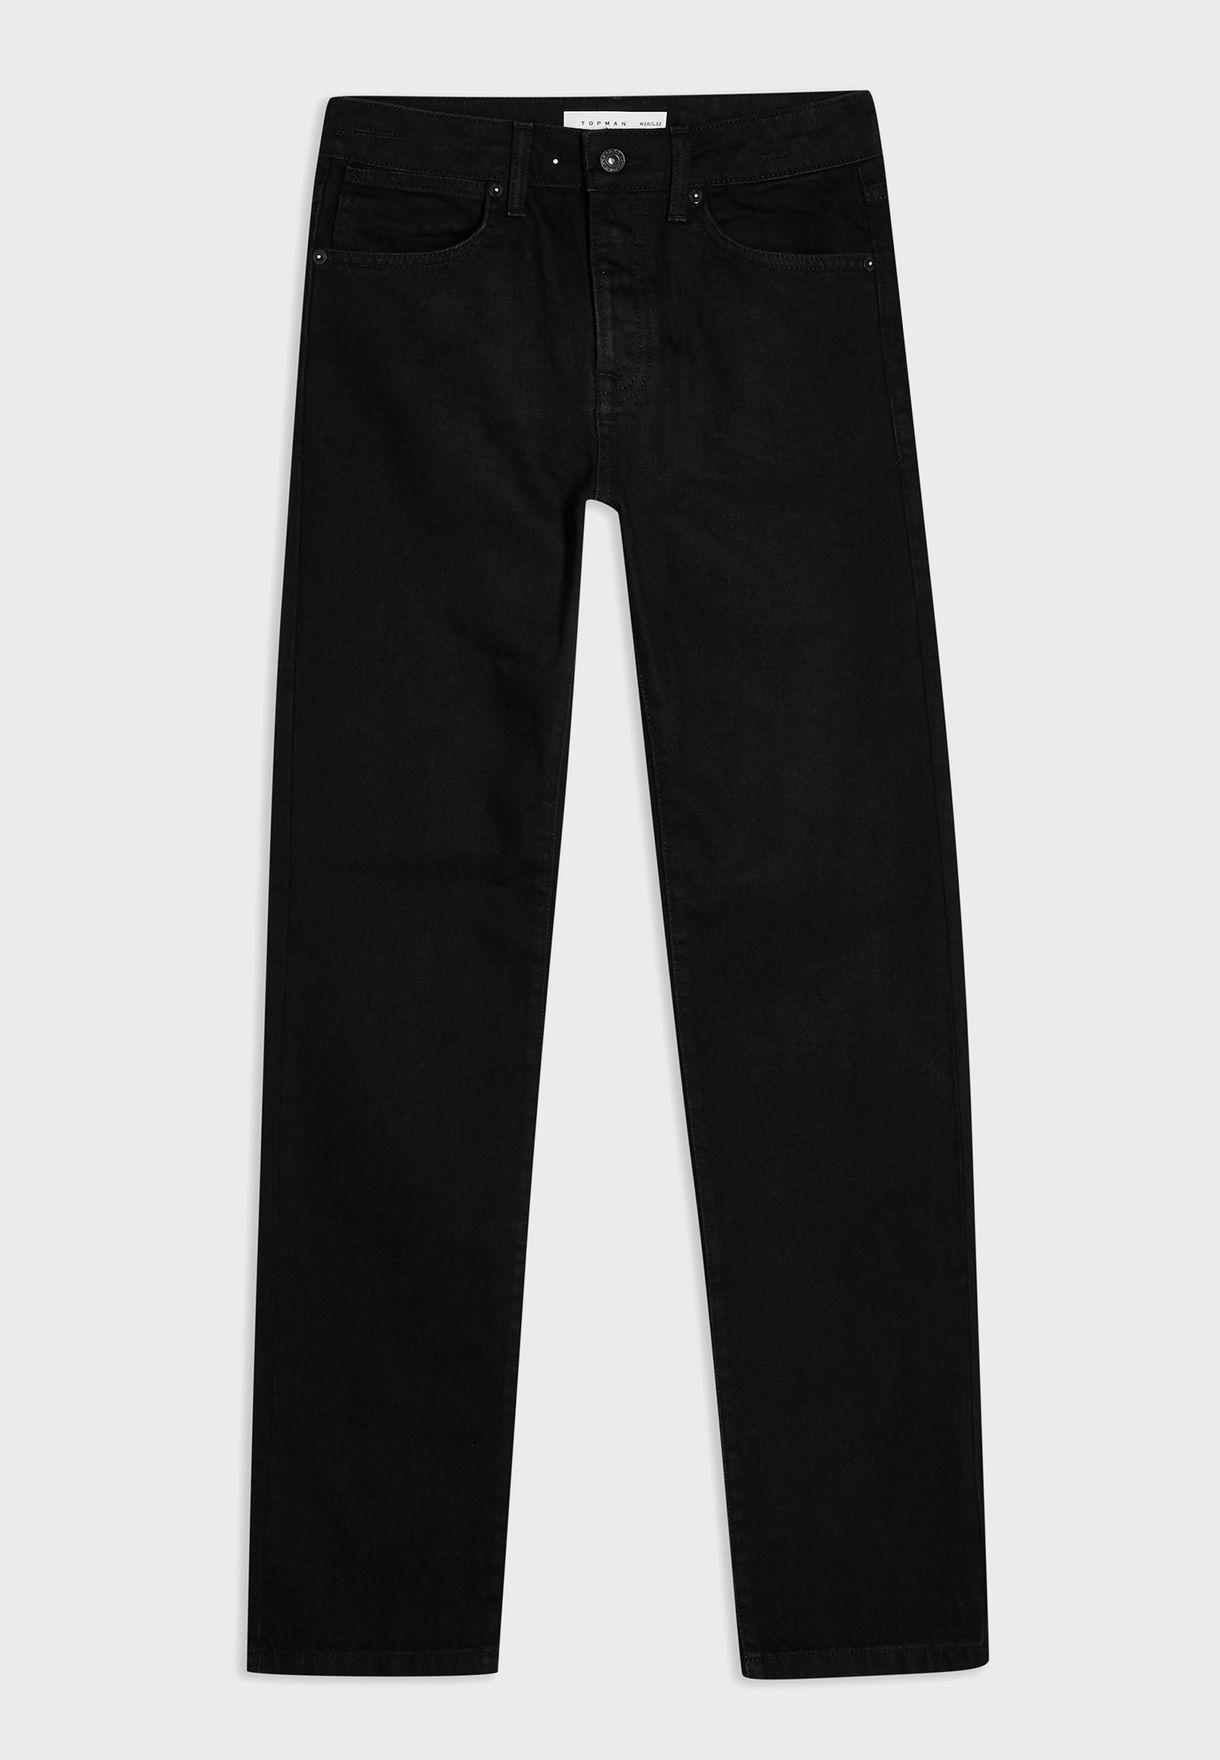 Washed Stretch Slim Jeans